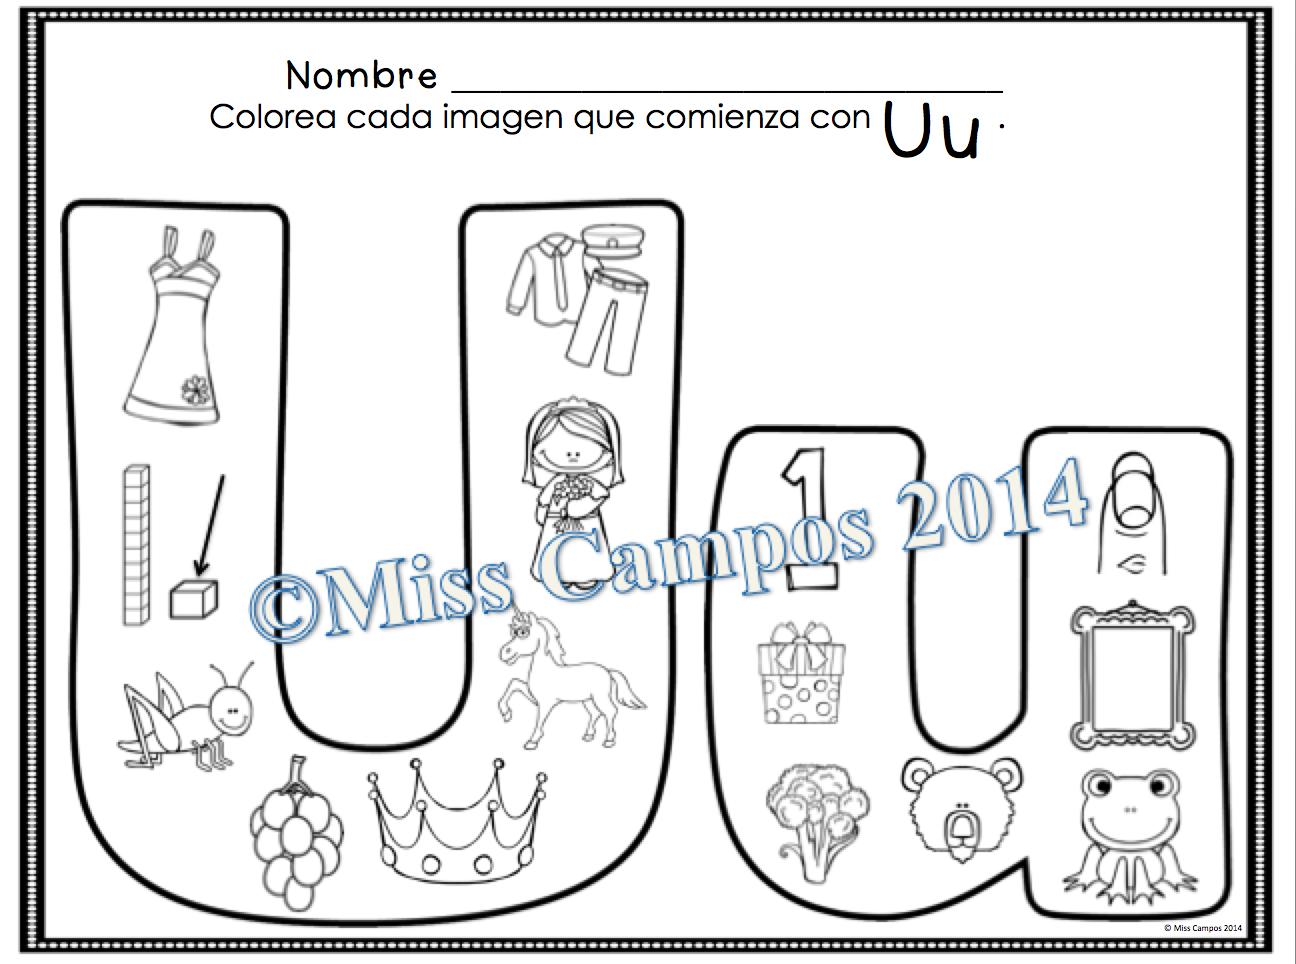 ¡Con brío! Beginning Spanish Activities Manual, 4th Edition